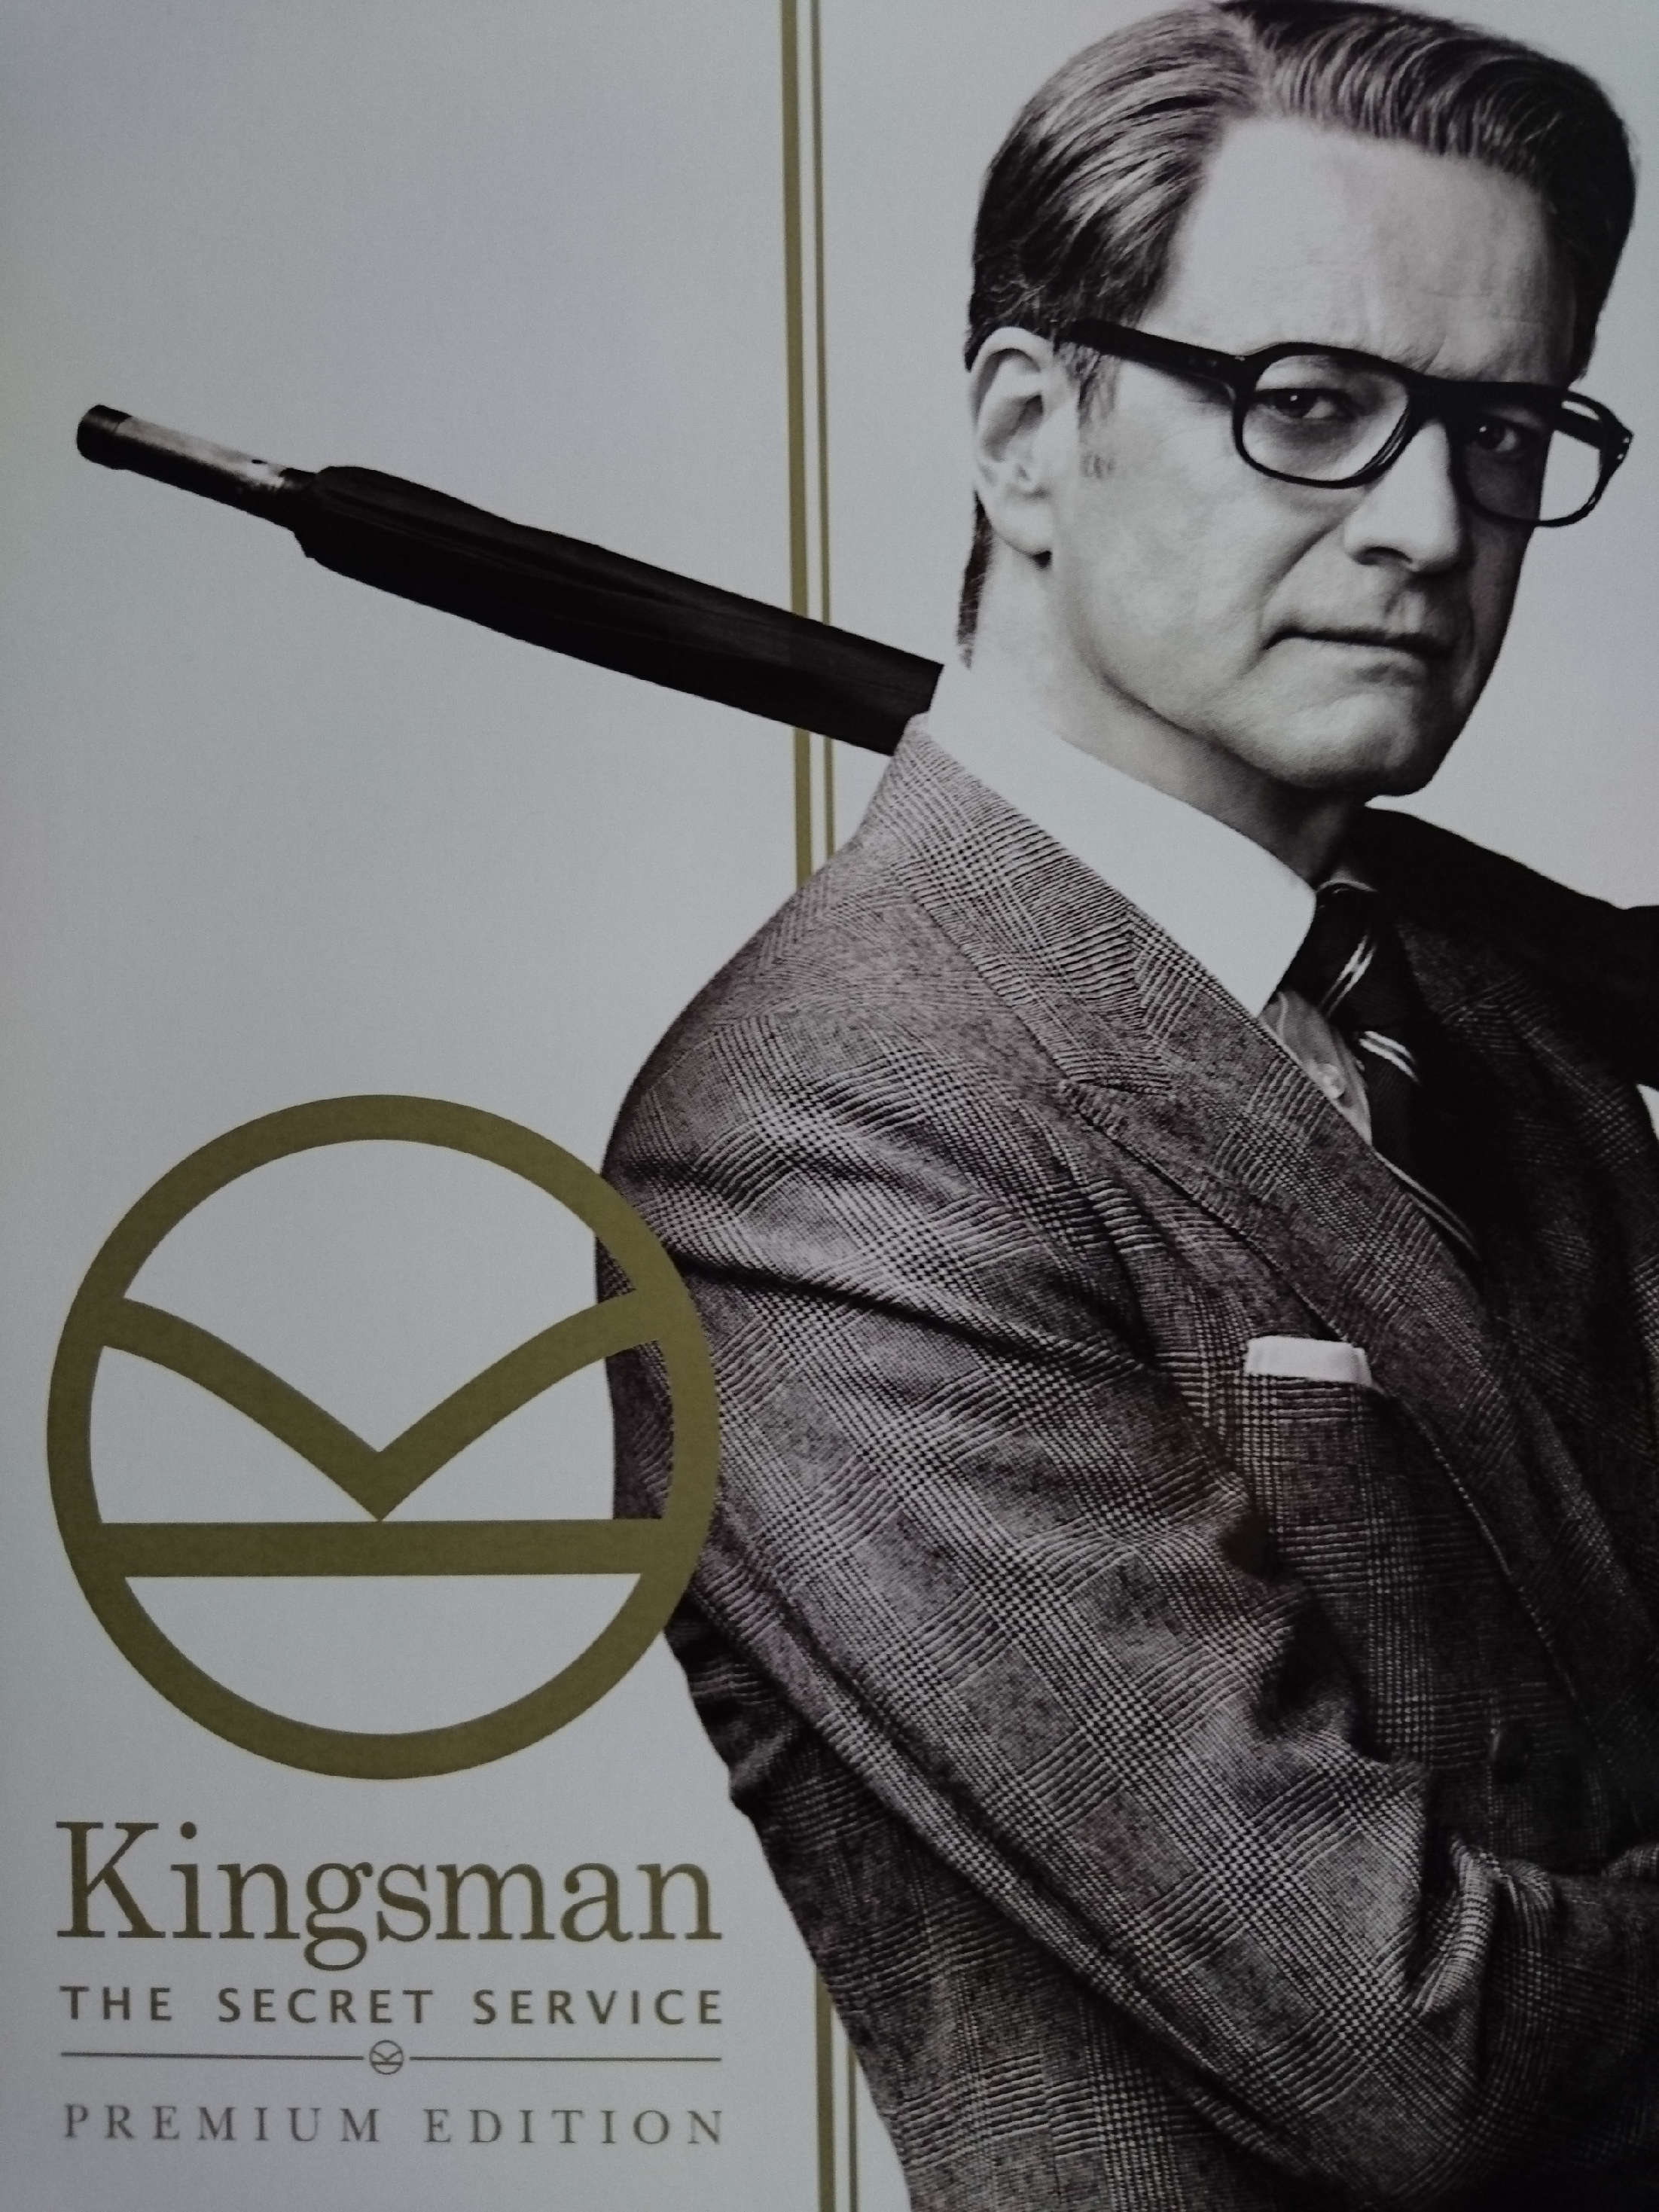 Kingsman5.jpg